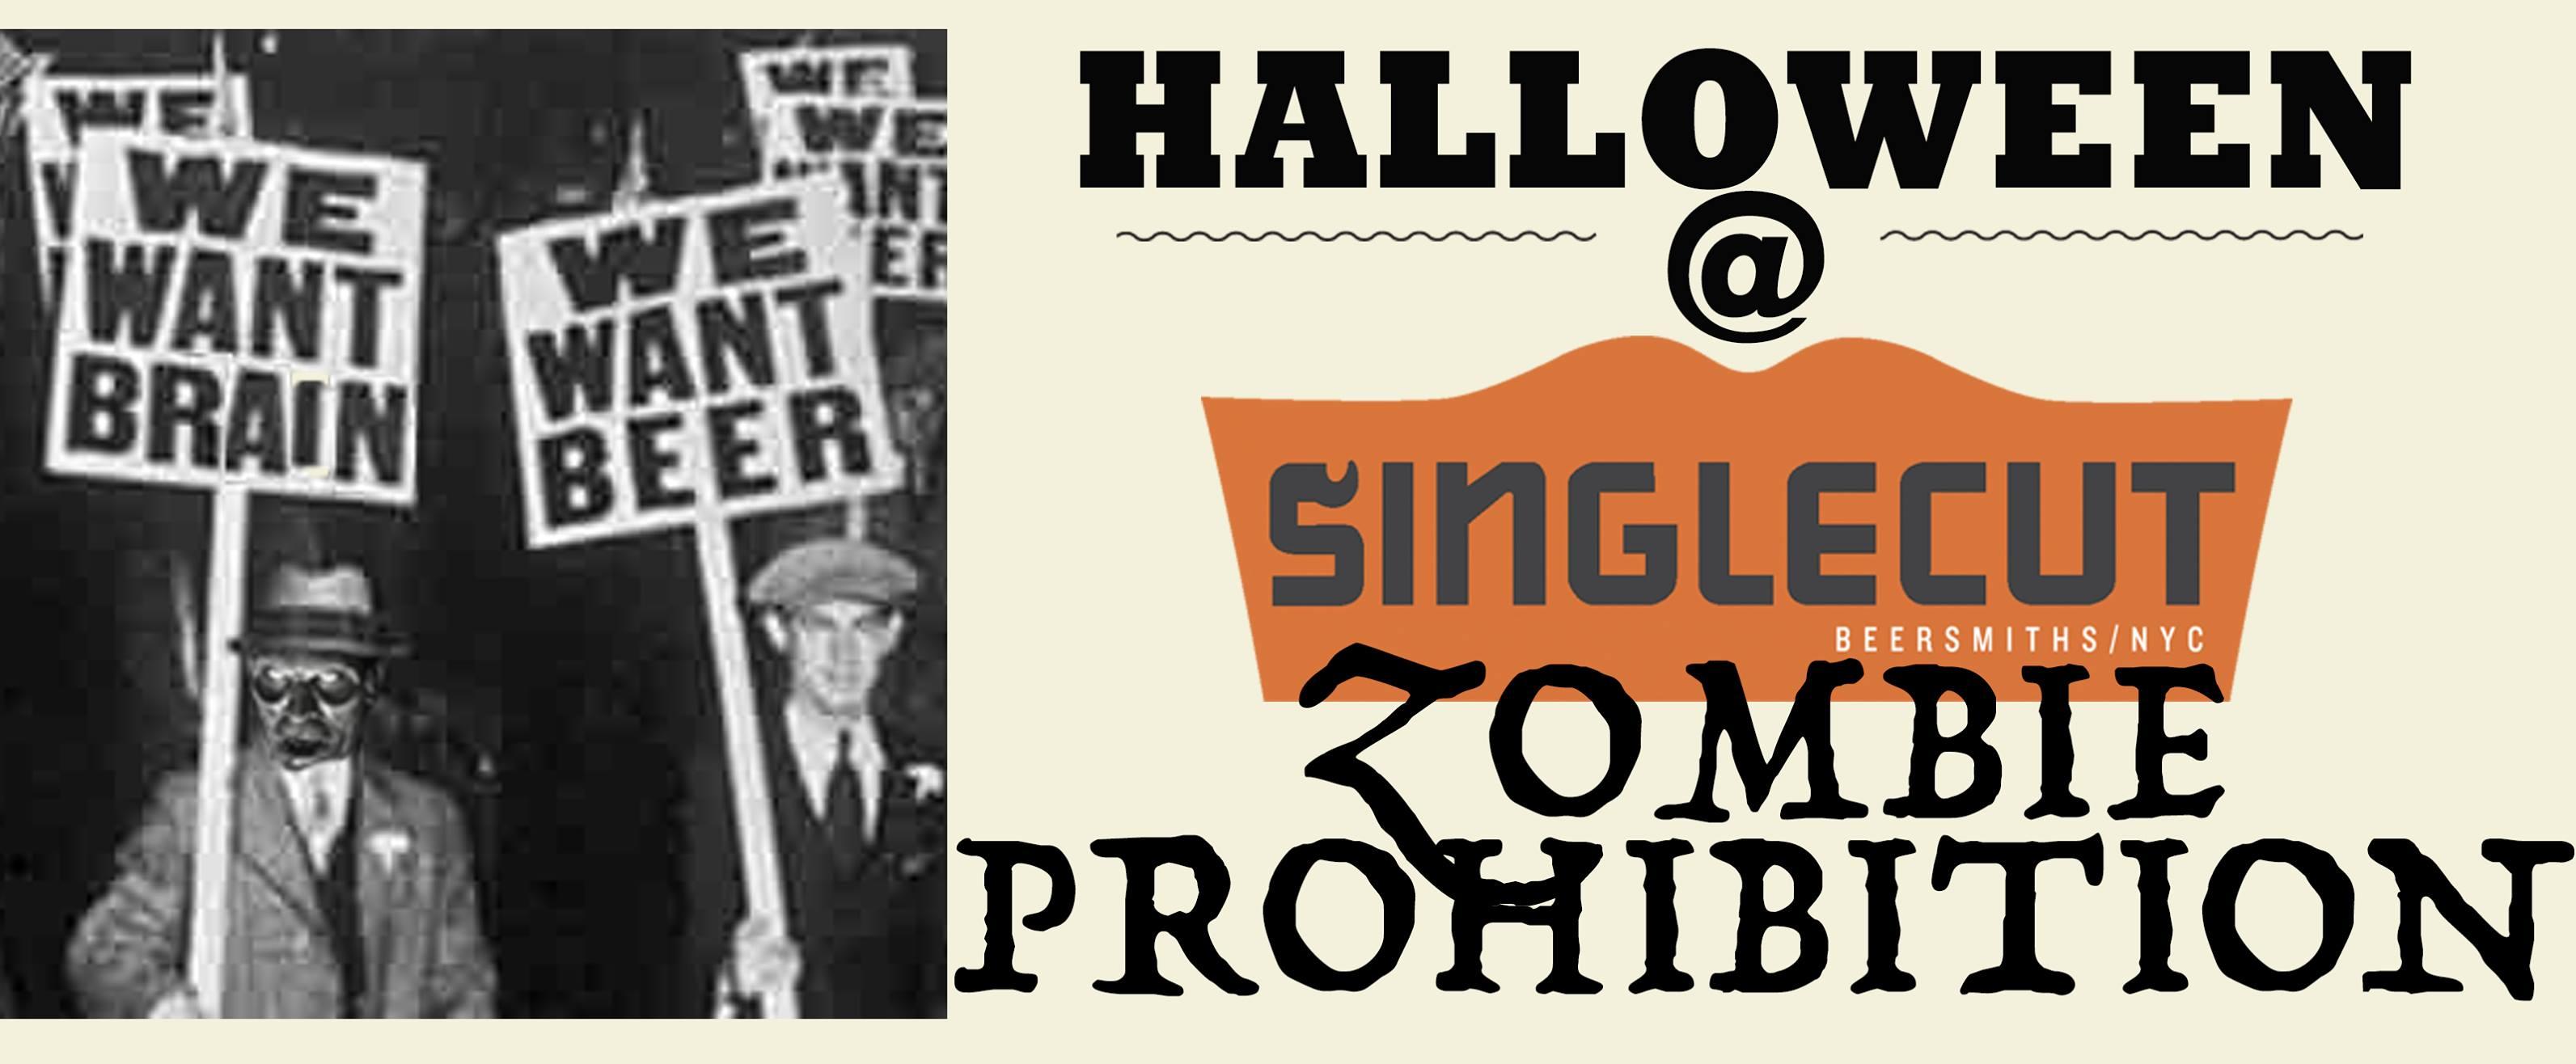 Halloween at SingleCut: Zombie Prohibition